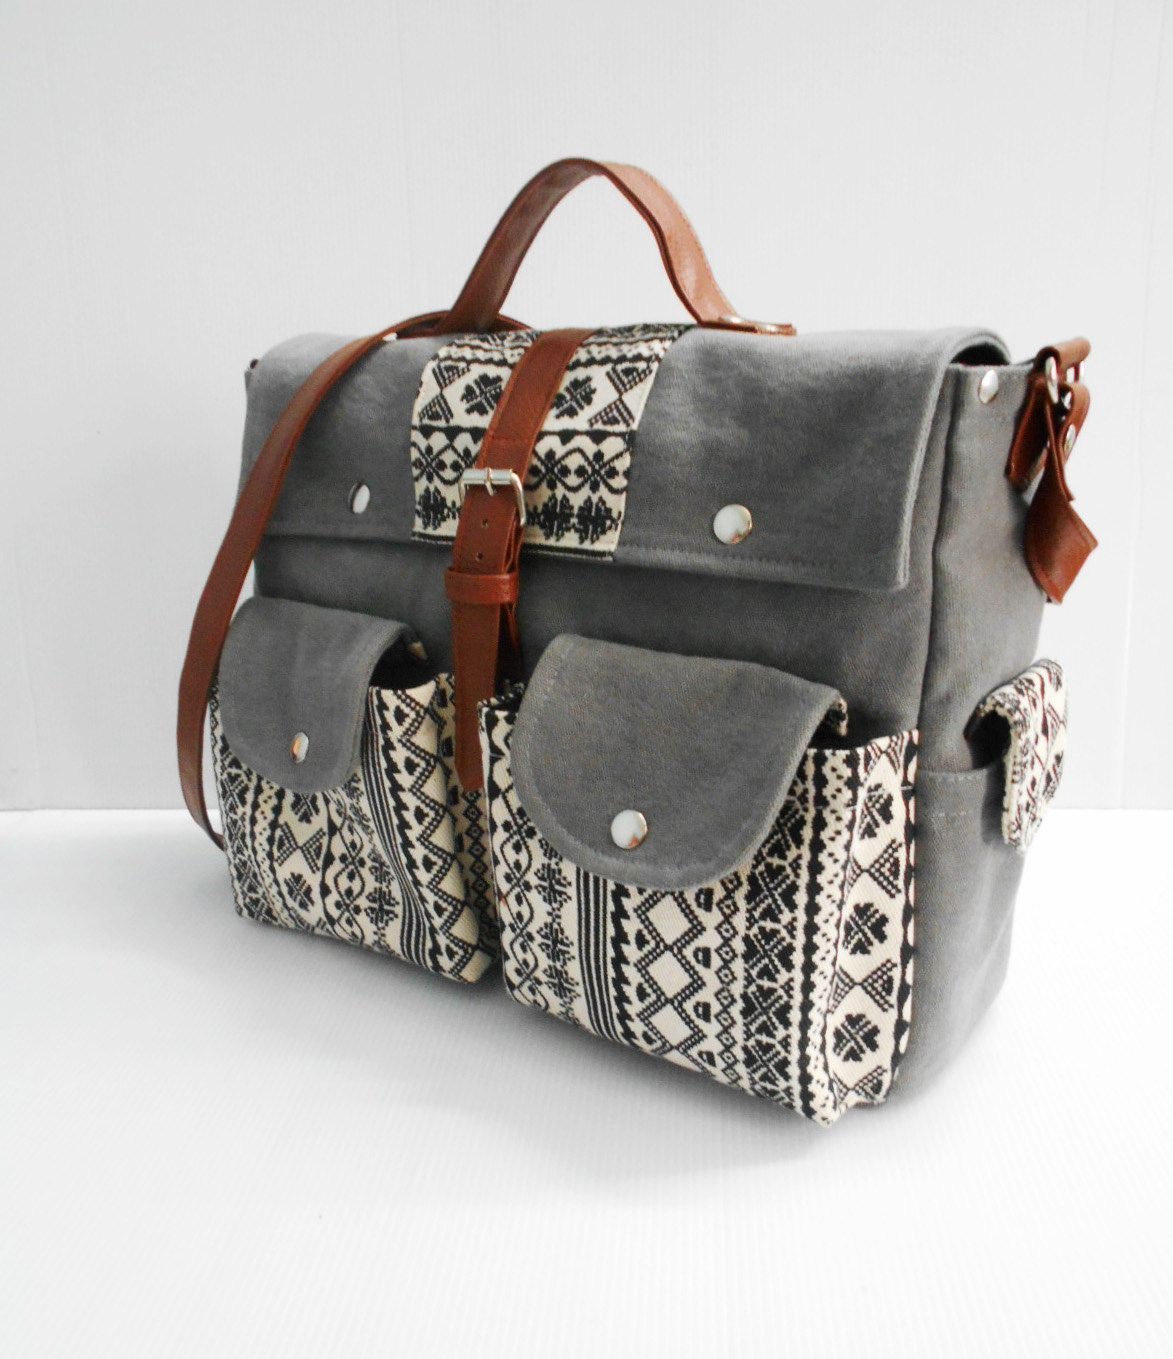 Gray Messenger Bags/Elephant Backpack/Canvas Wash Fabric/Handbags/Bags&Purses/School Bags/Bags/Backpacks (55.00 USD) by PMKSHOP